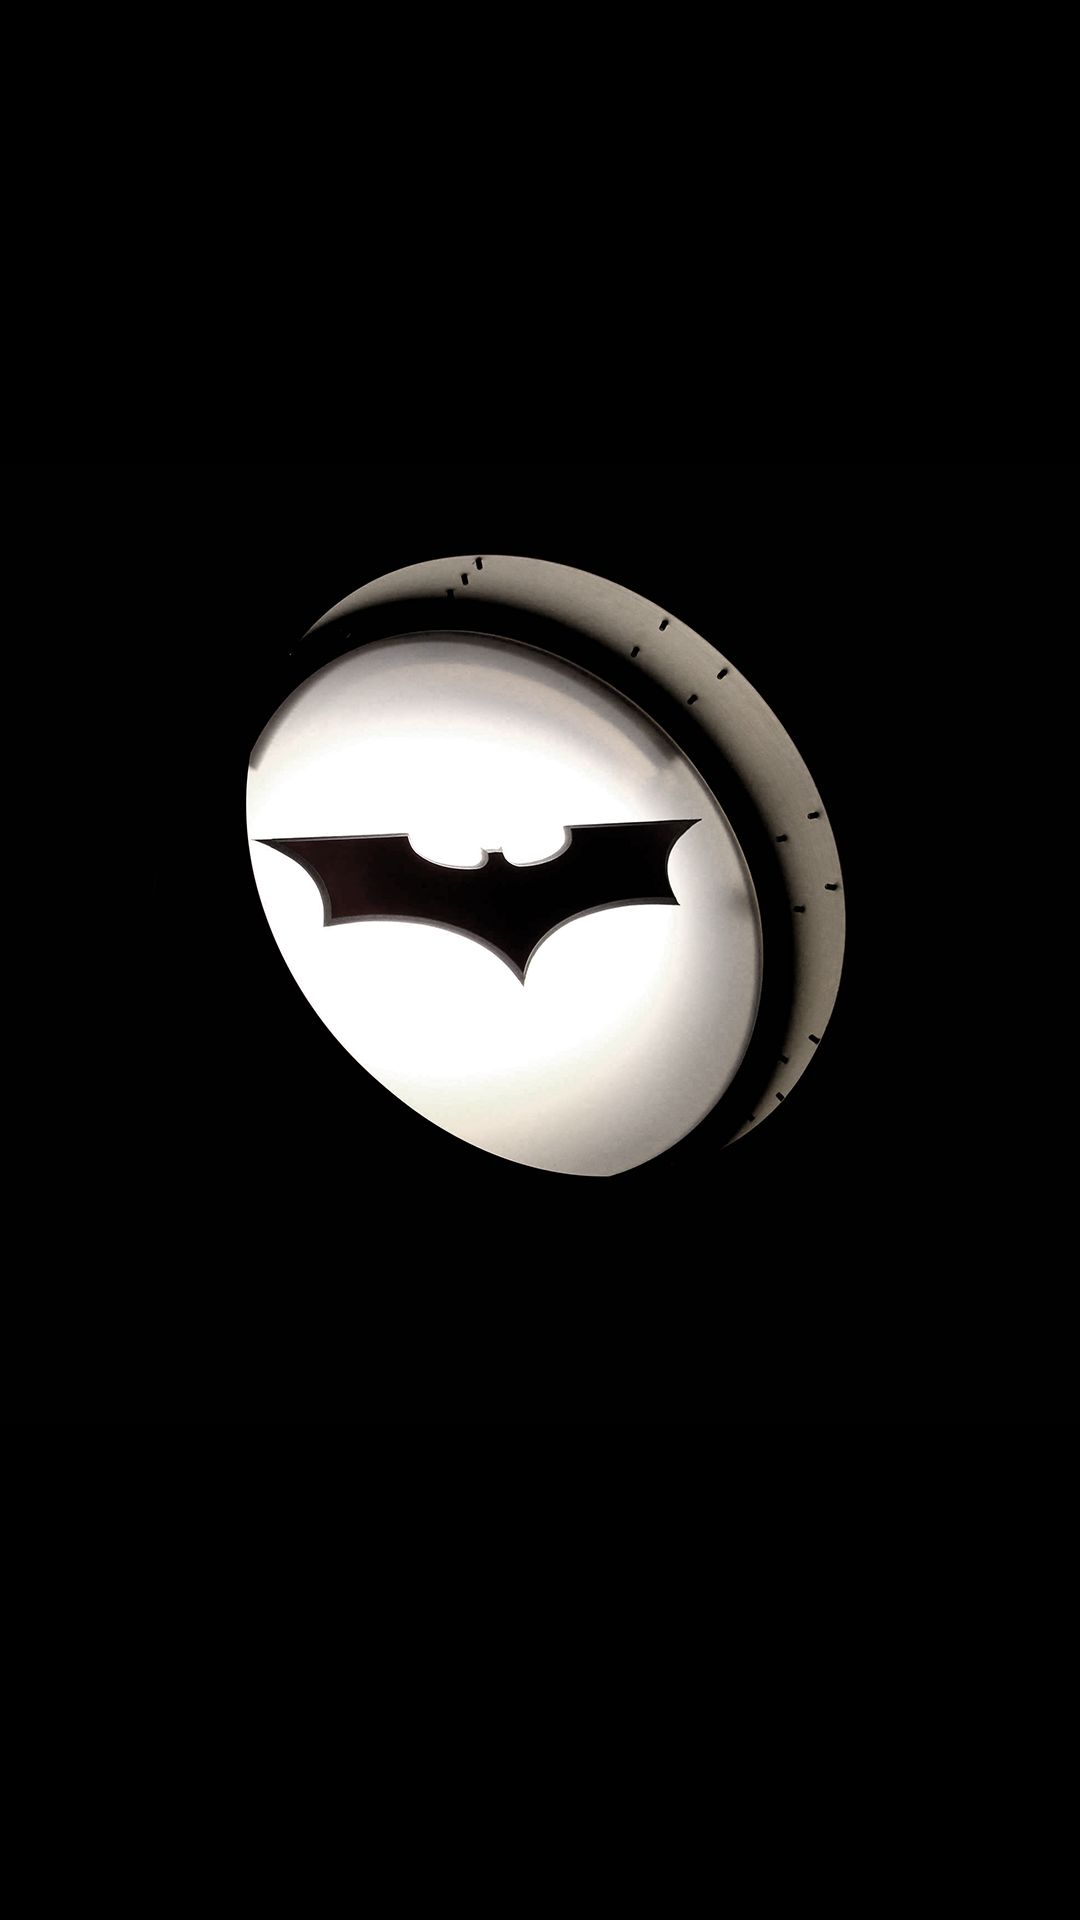 Bat Signal Fhd Wallpaper